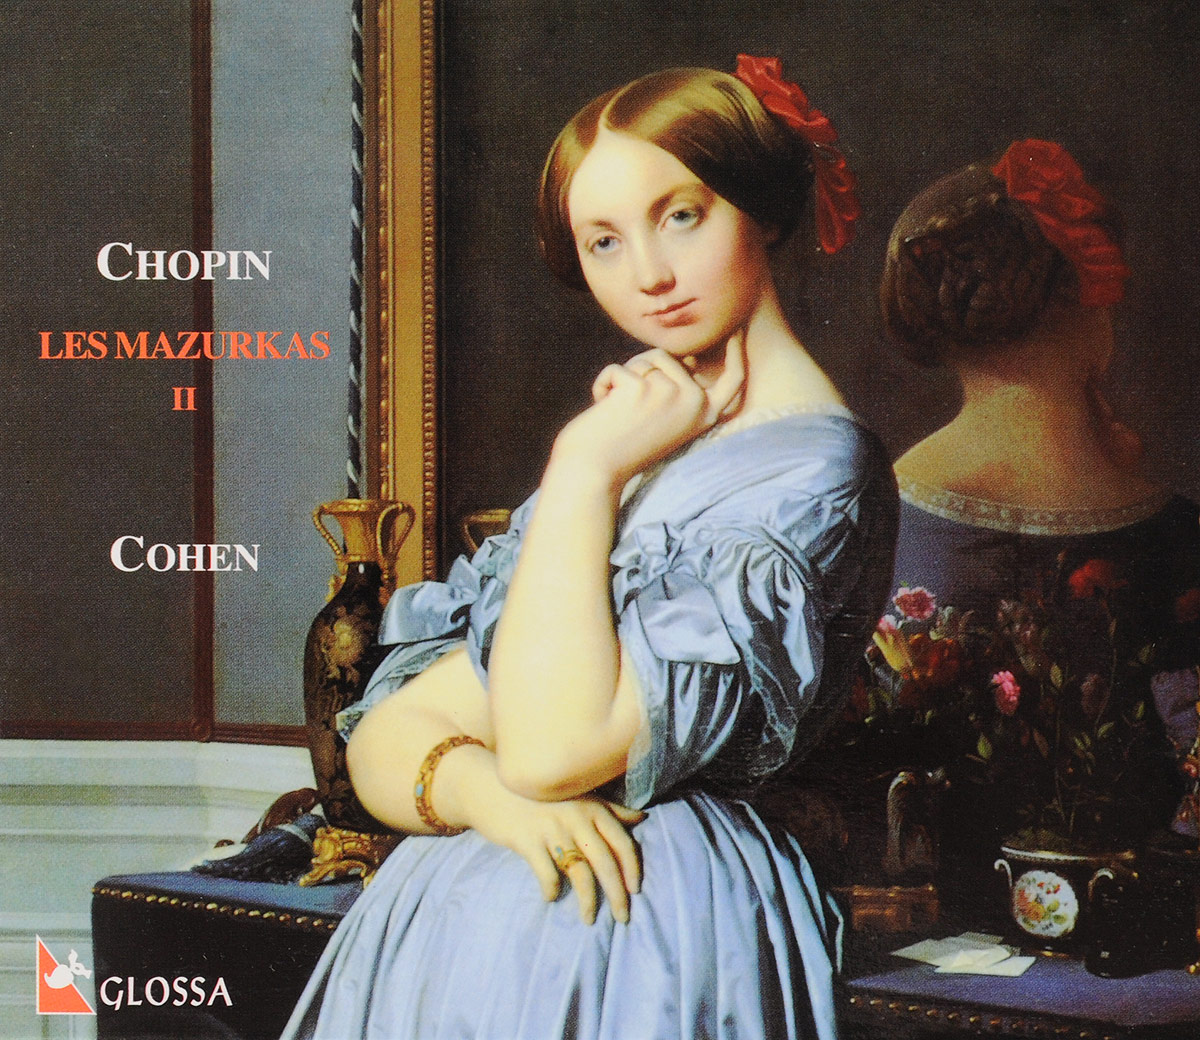 Fryderyk Franciszek Chopin. Chopin: Mazurkas, Vol.2 (Cohen) (2 CD)